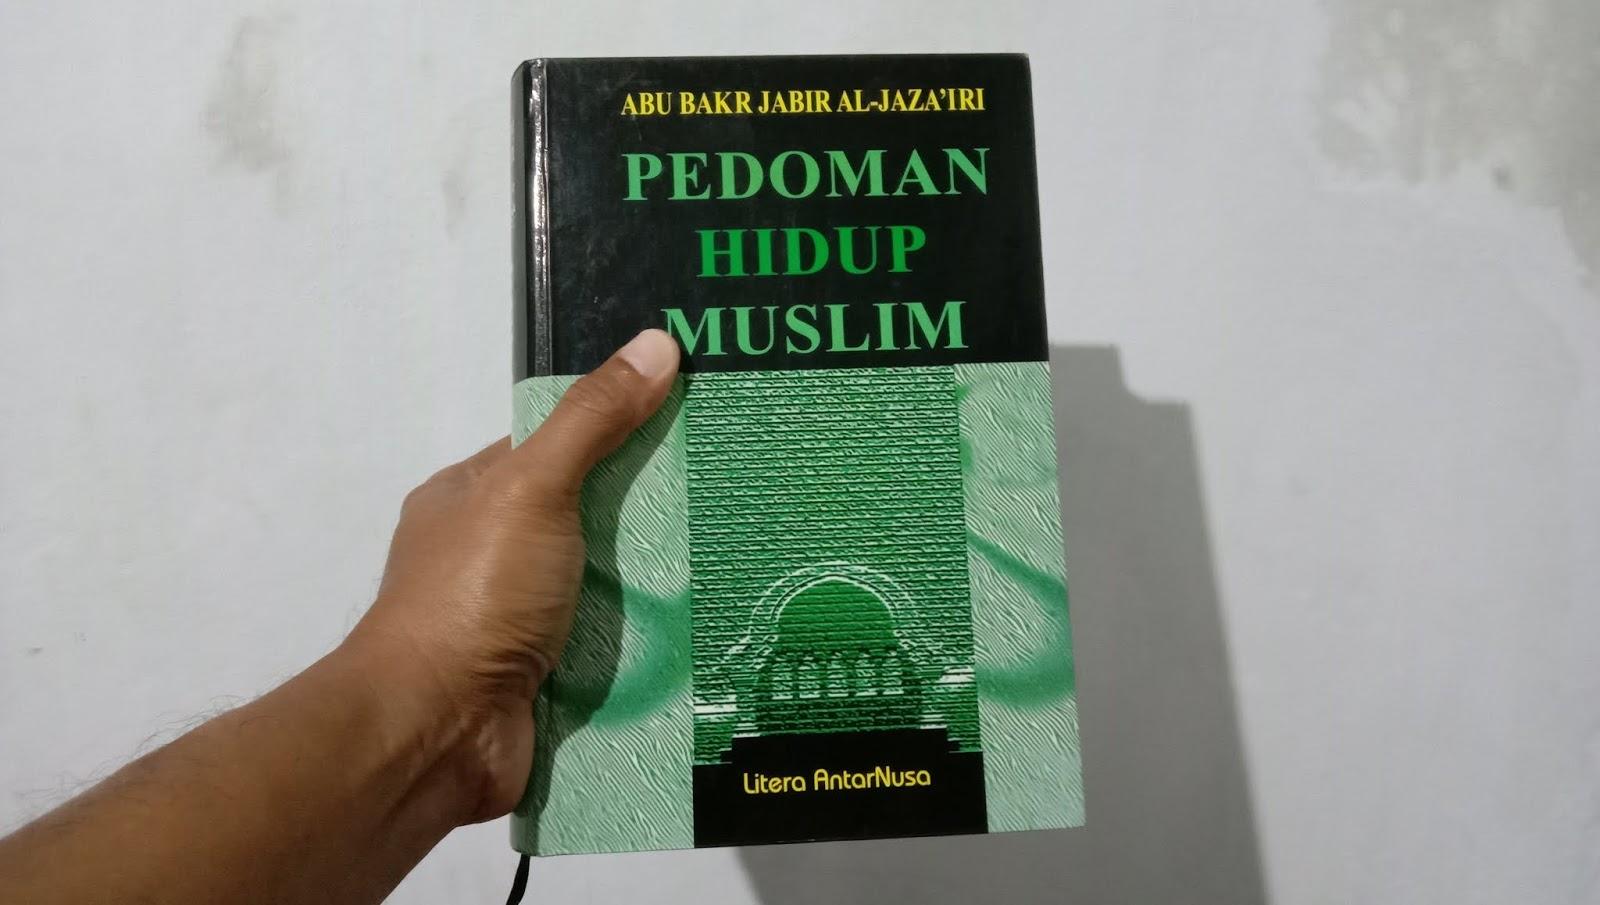 Buku Pedoman Hidup Muslim